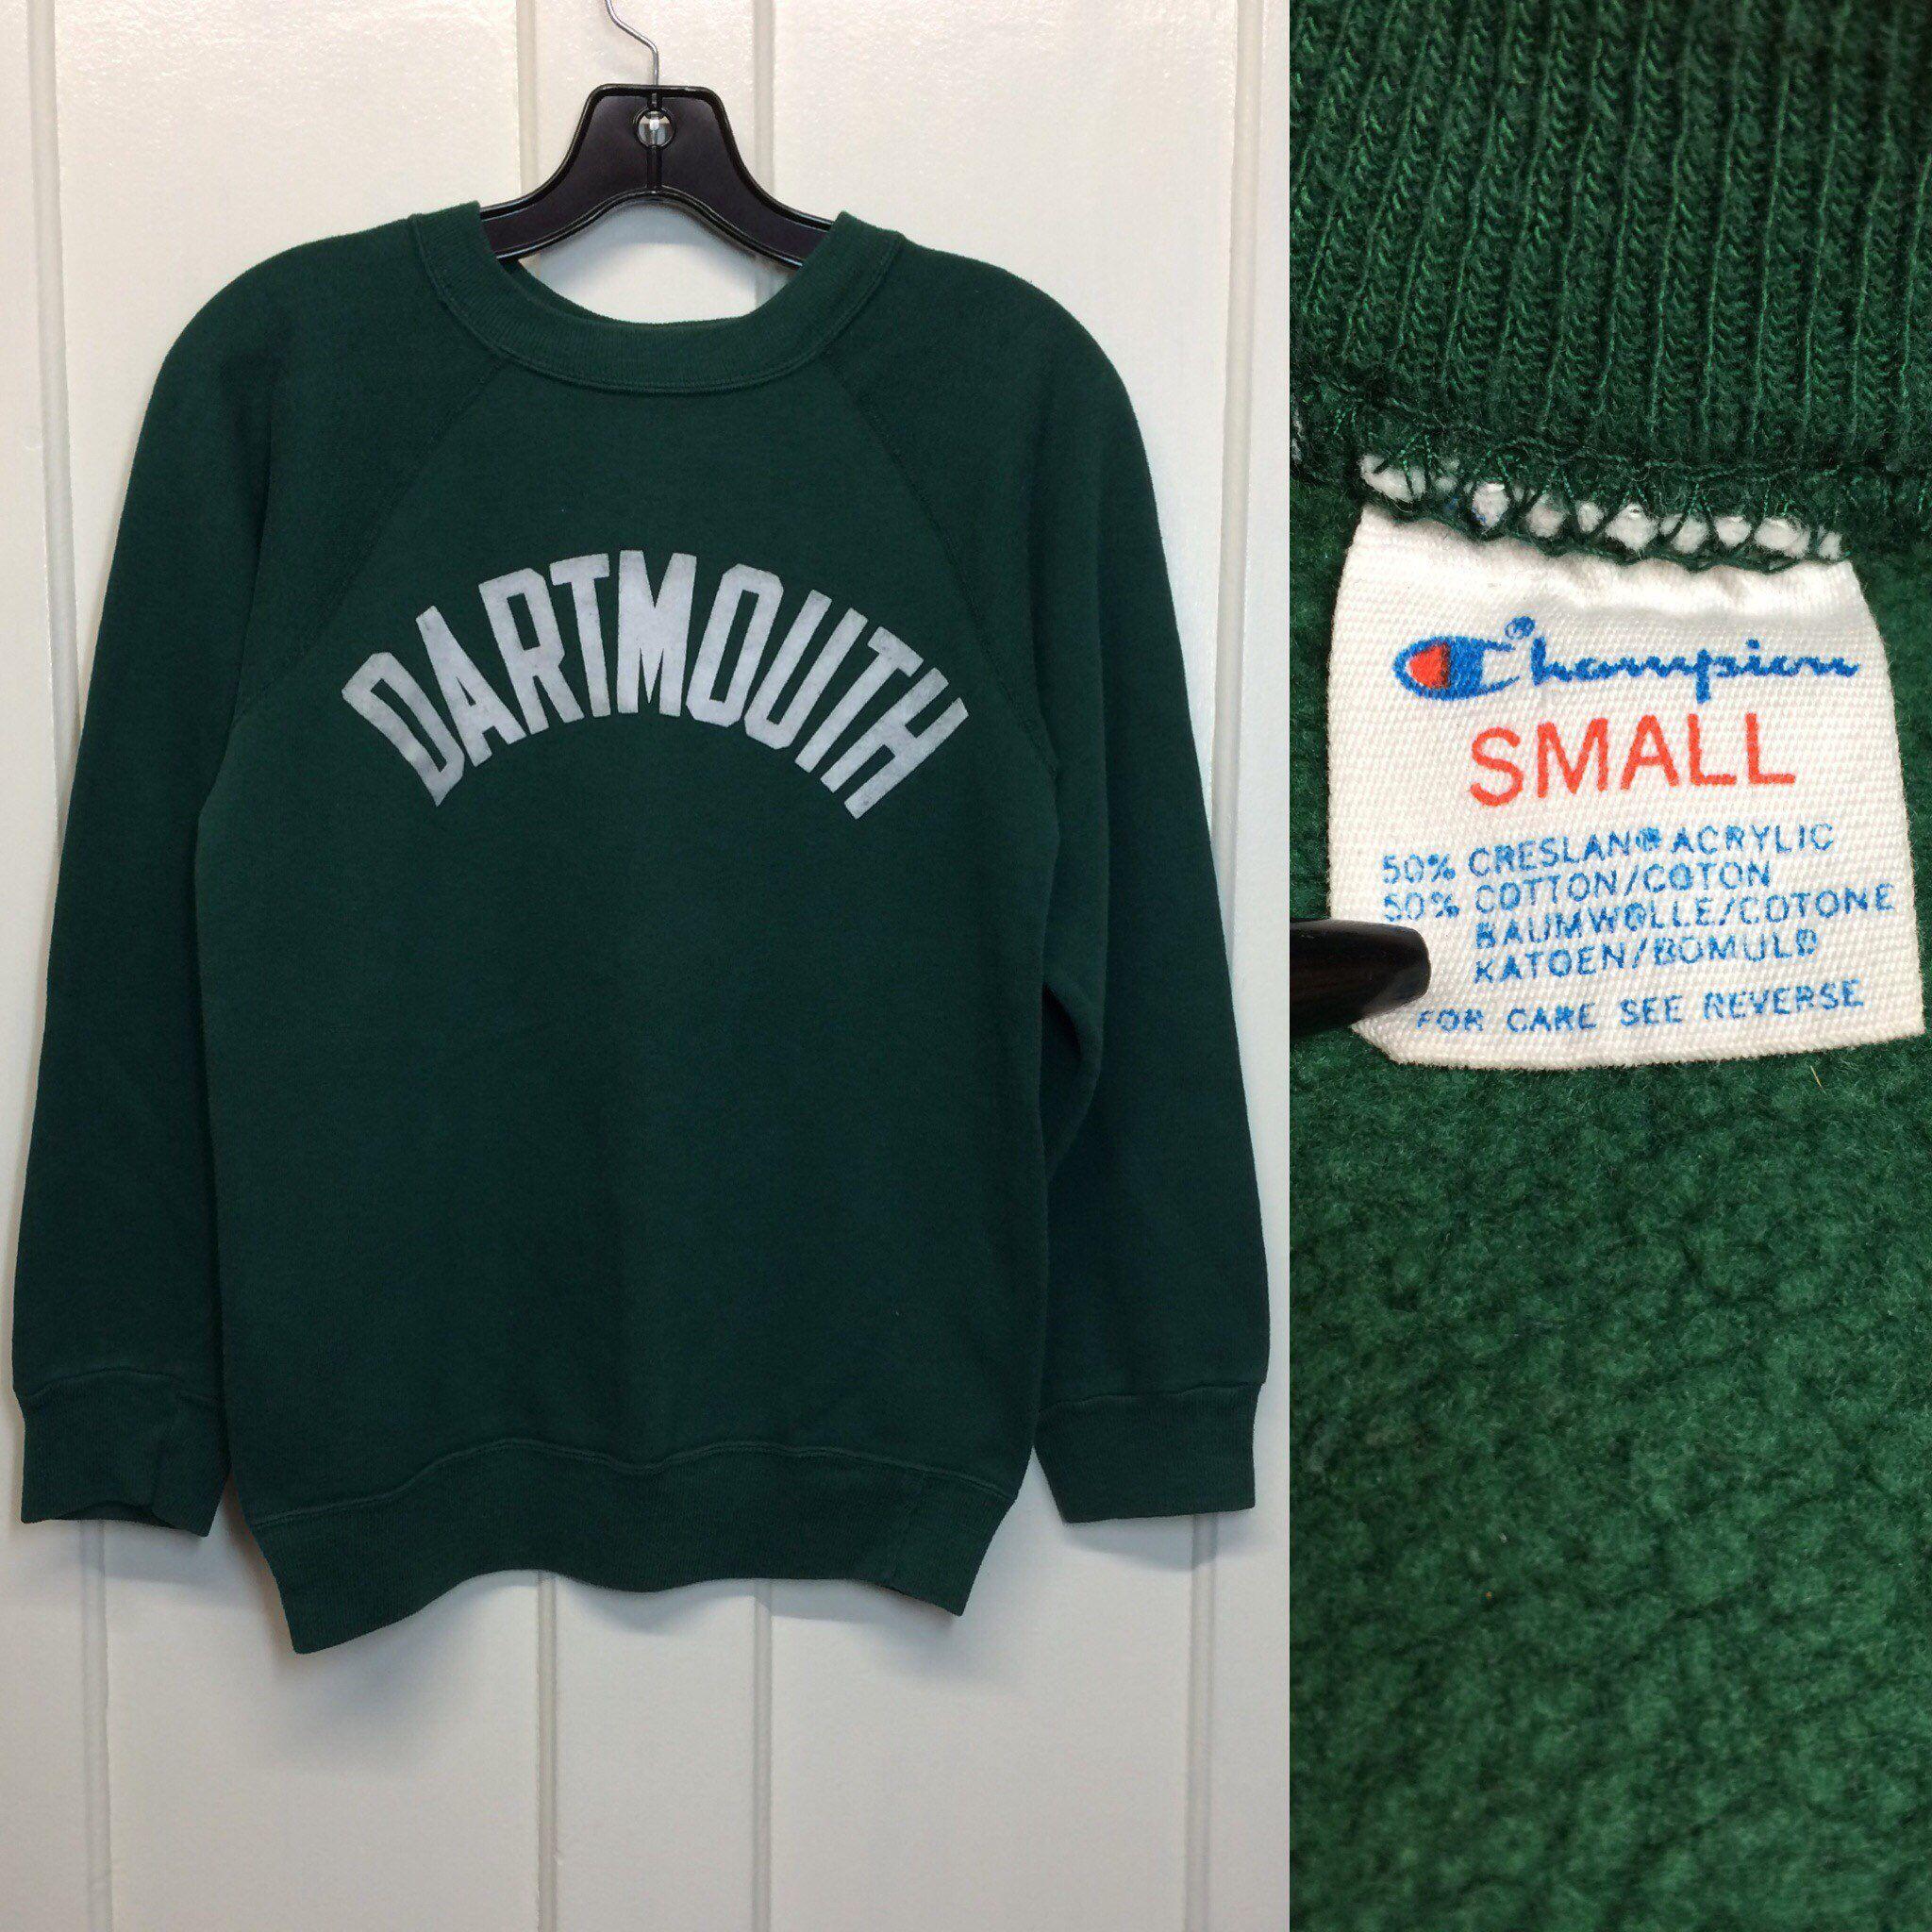 1980s Dartmouth College Ivy League Champion Brand Soft Cotton Etsy Champion Brand Cotton Sweatshirts [ 2048 x 2048 Pixel ]